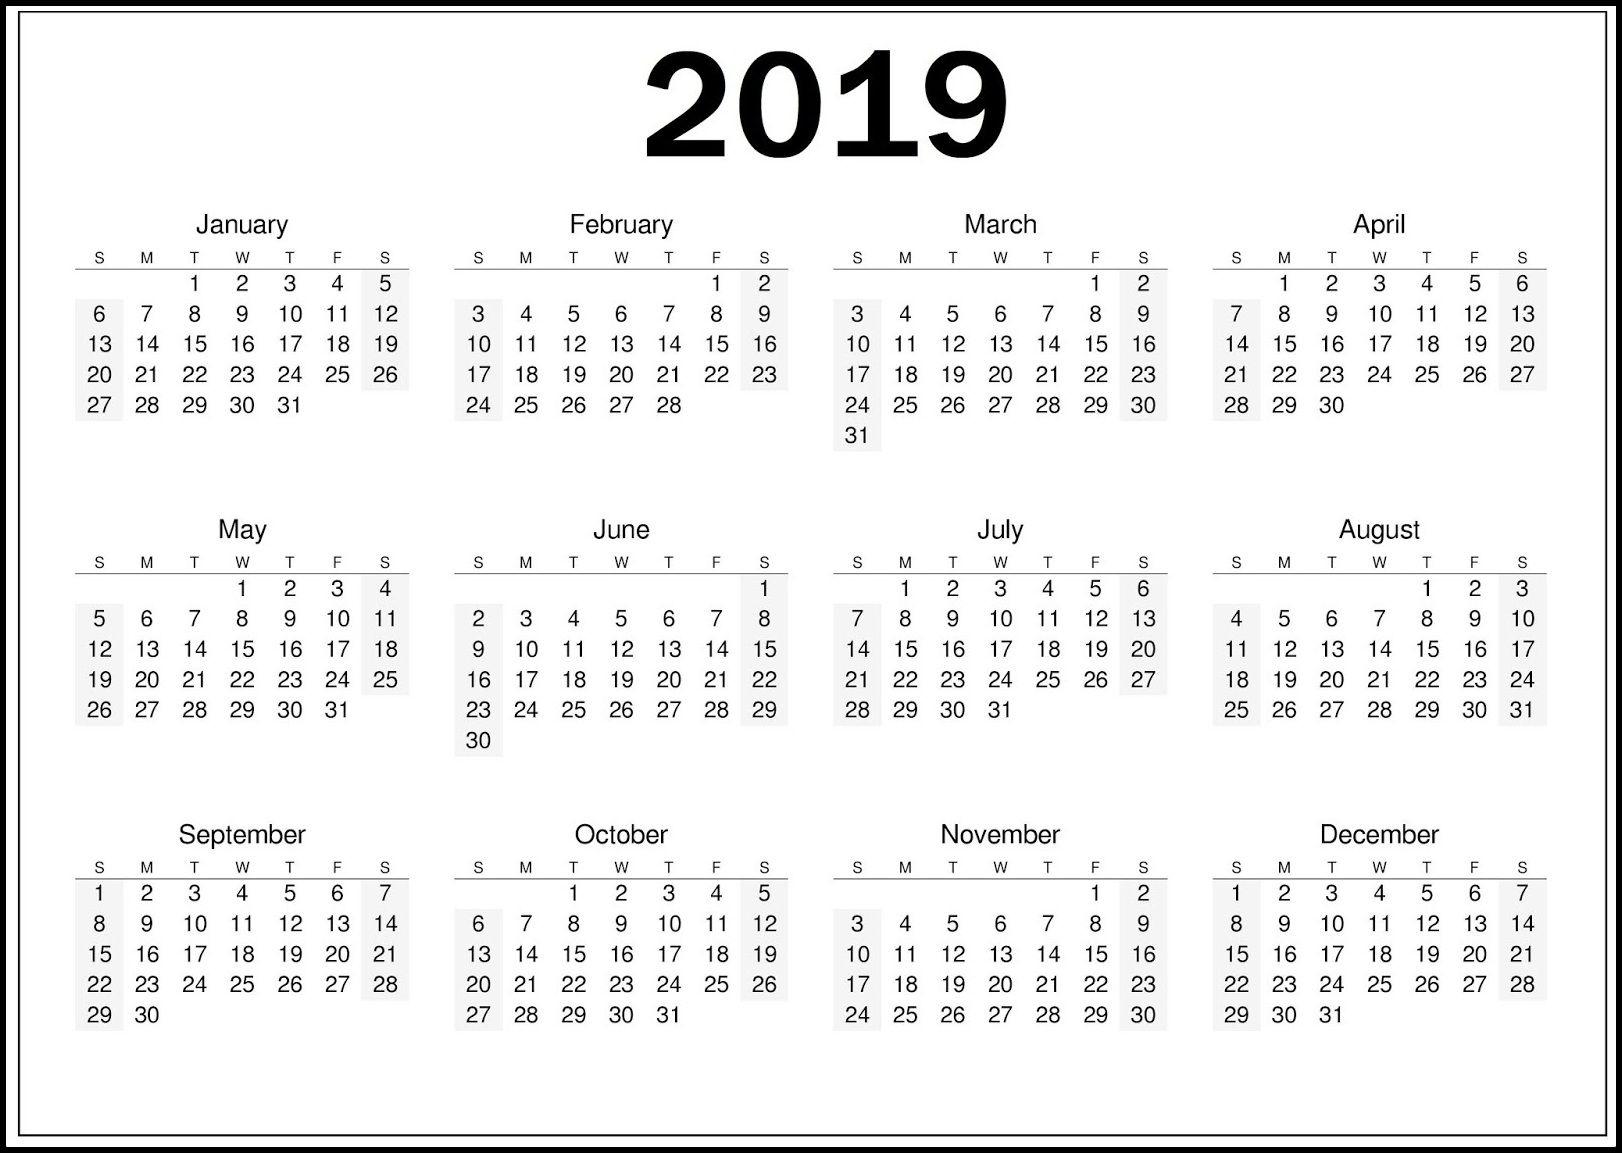 Blank Calendar Template 2019 Download | Top 10 Free 2019 Calendar within Pinterest 3 Month Calendar Print Out